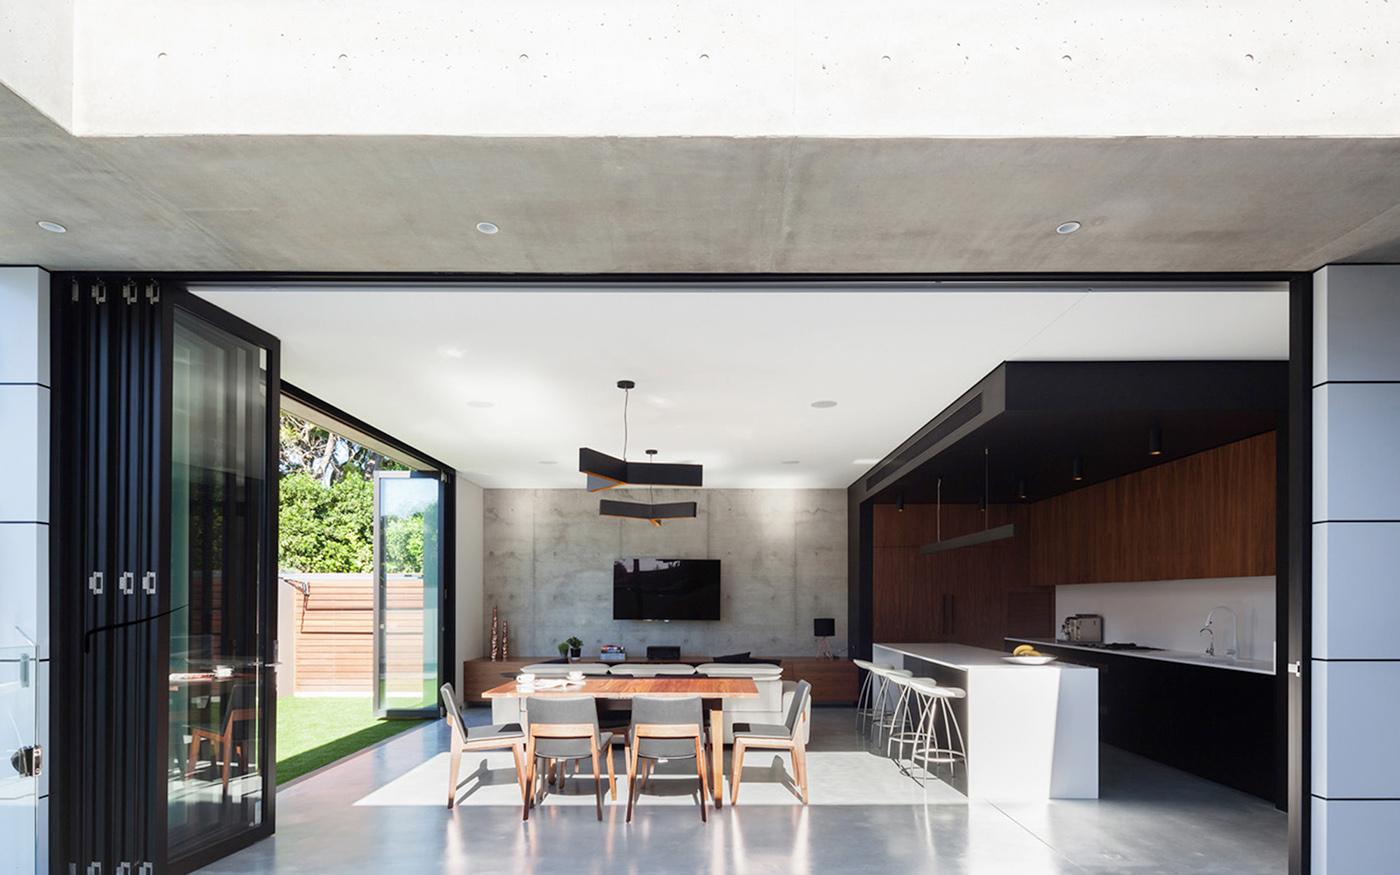 architecture design interior design  concrete concept conceptual luxury lifestyle sophisticated Brutalism